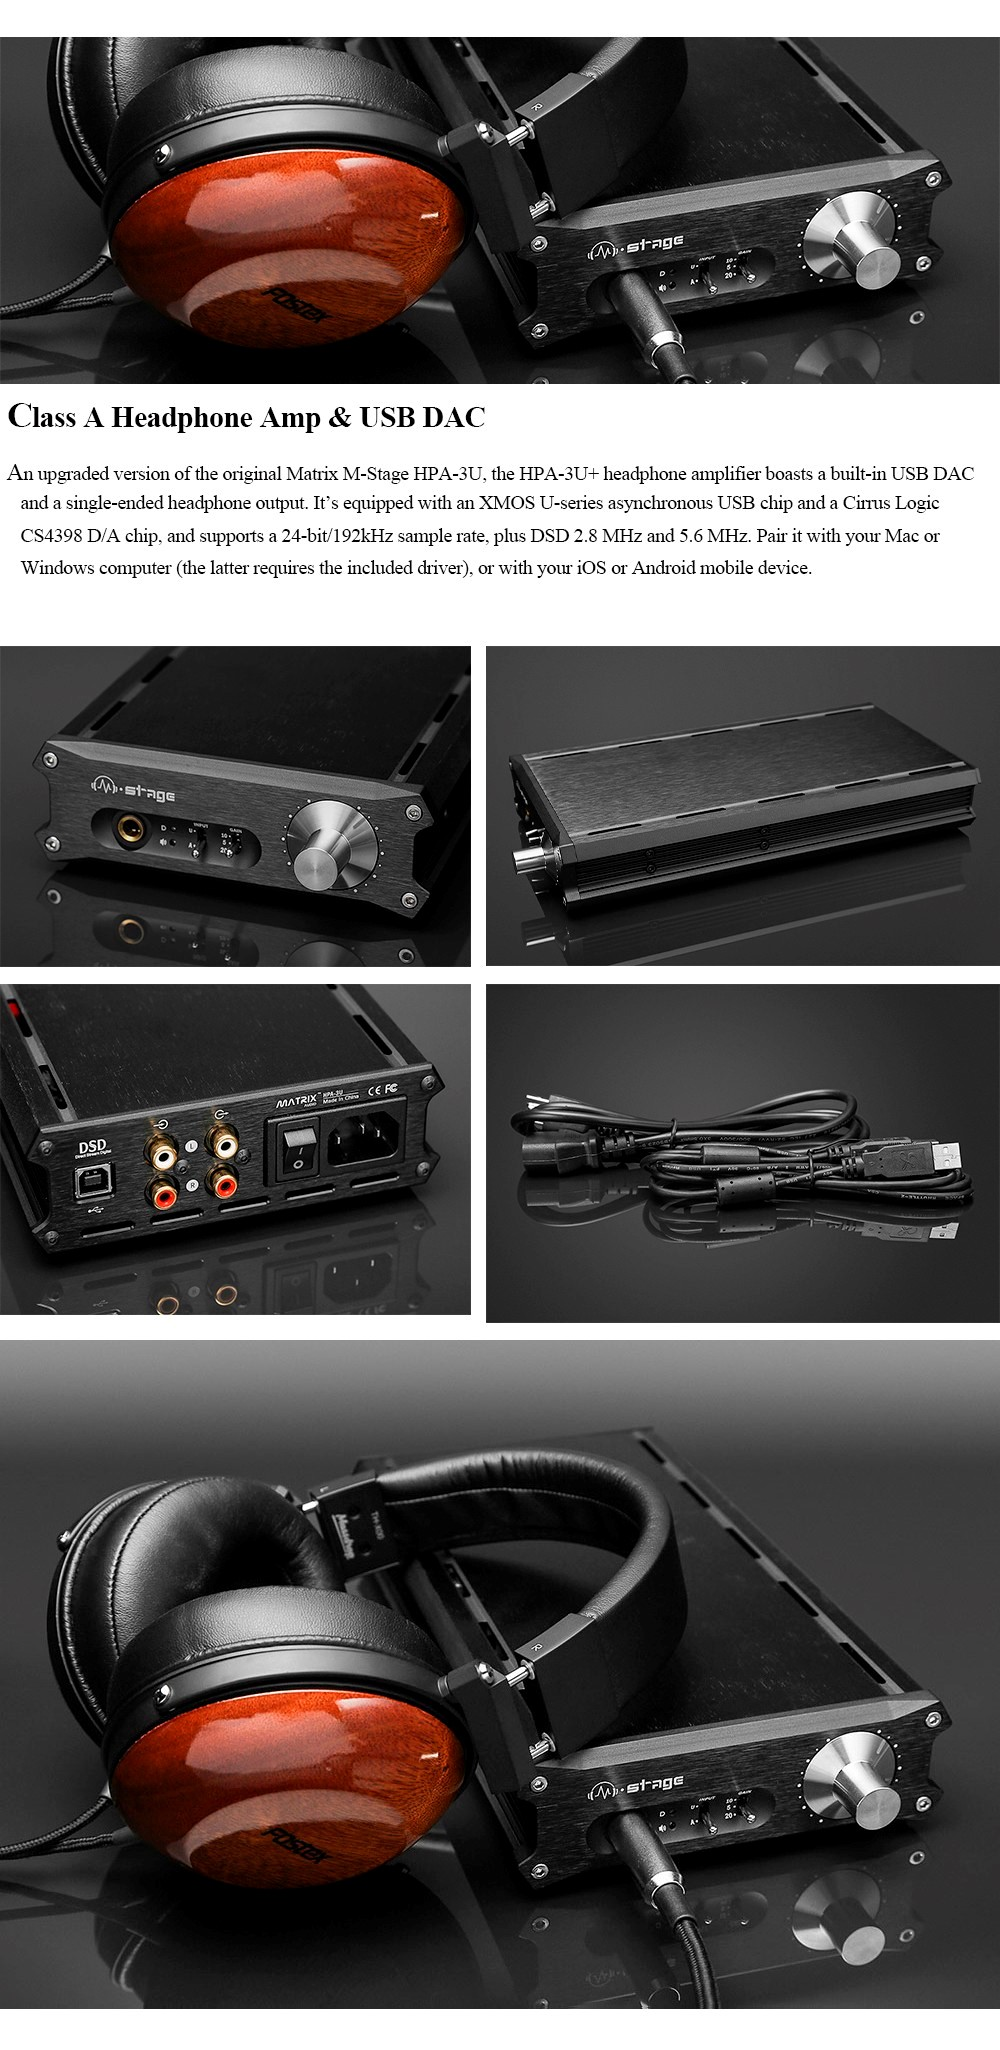 Matrix M-Stage HPA-3U Class A Headphone Amplifier + USB DAC Decoder